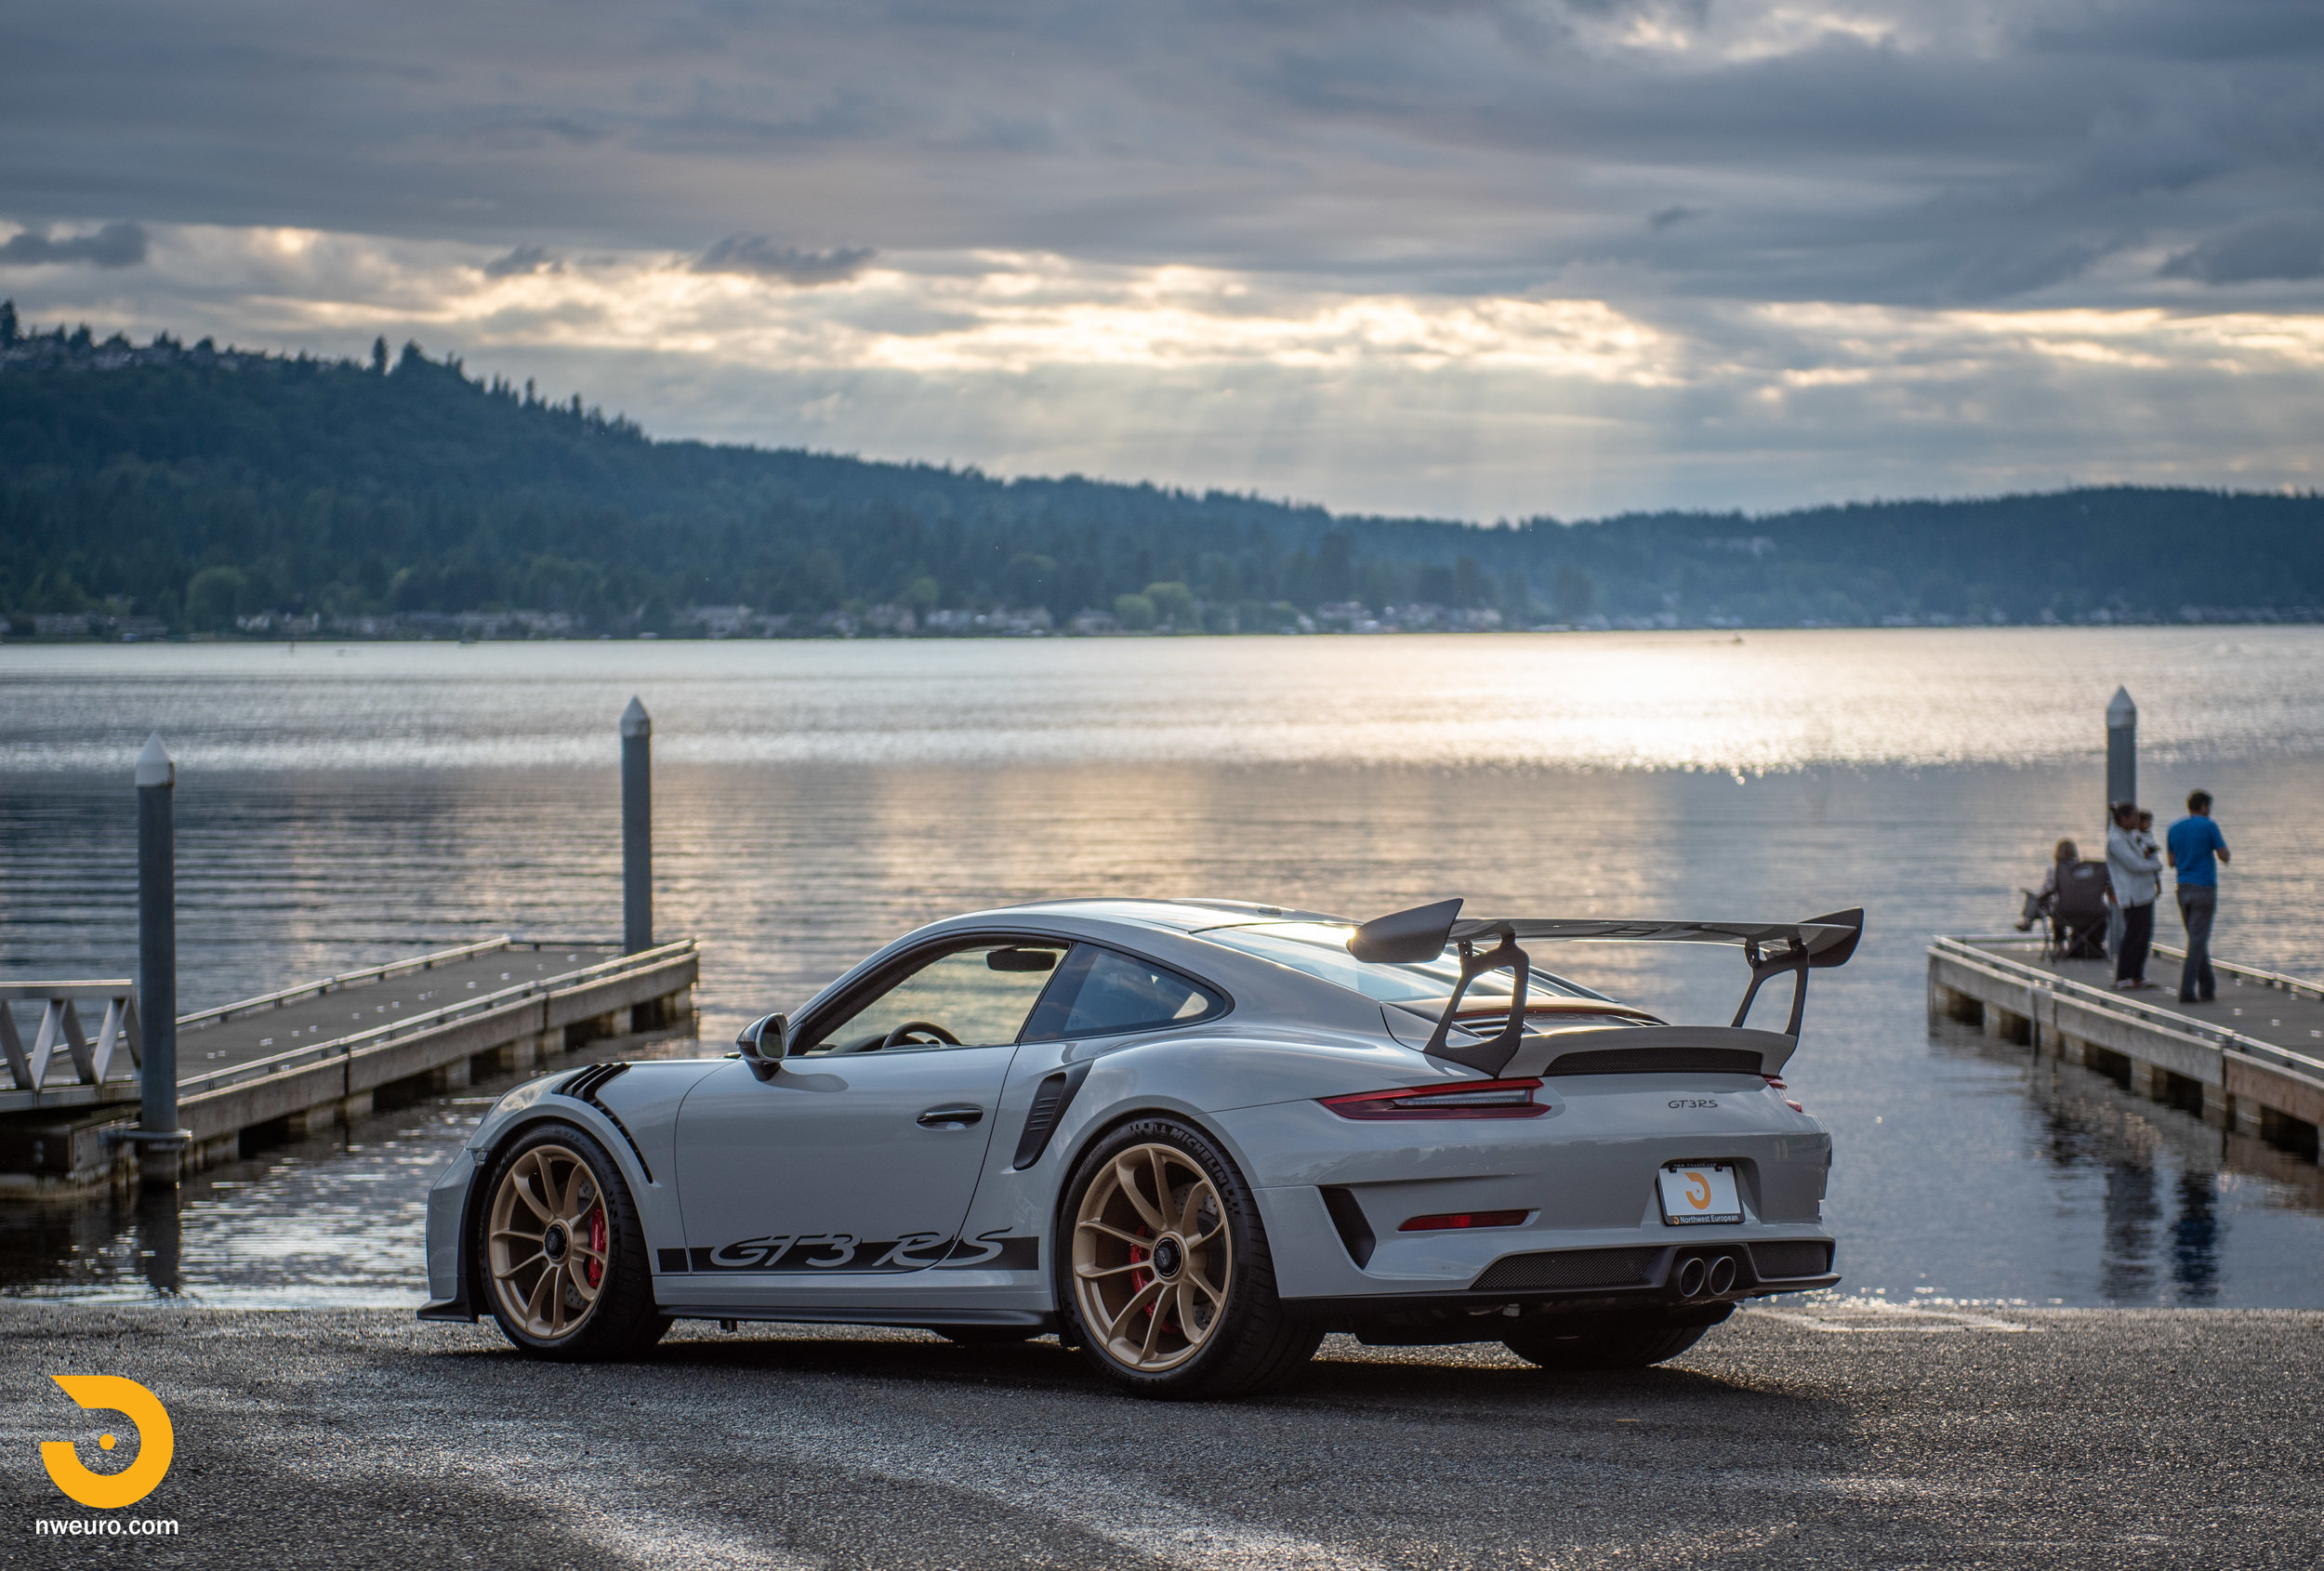 2019 Porsche GT3 RS - Chalk-80.jpg